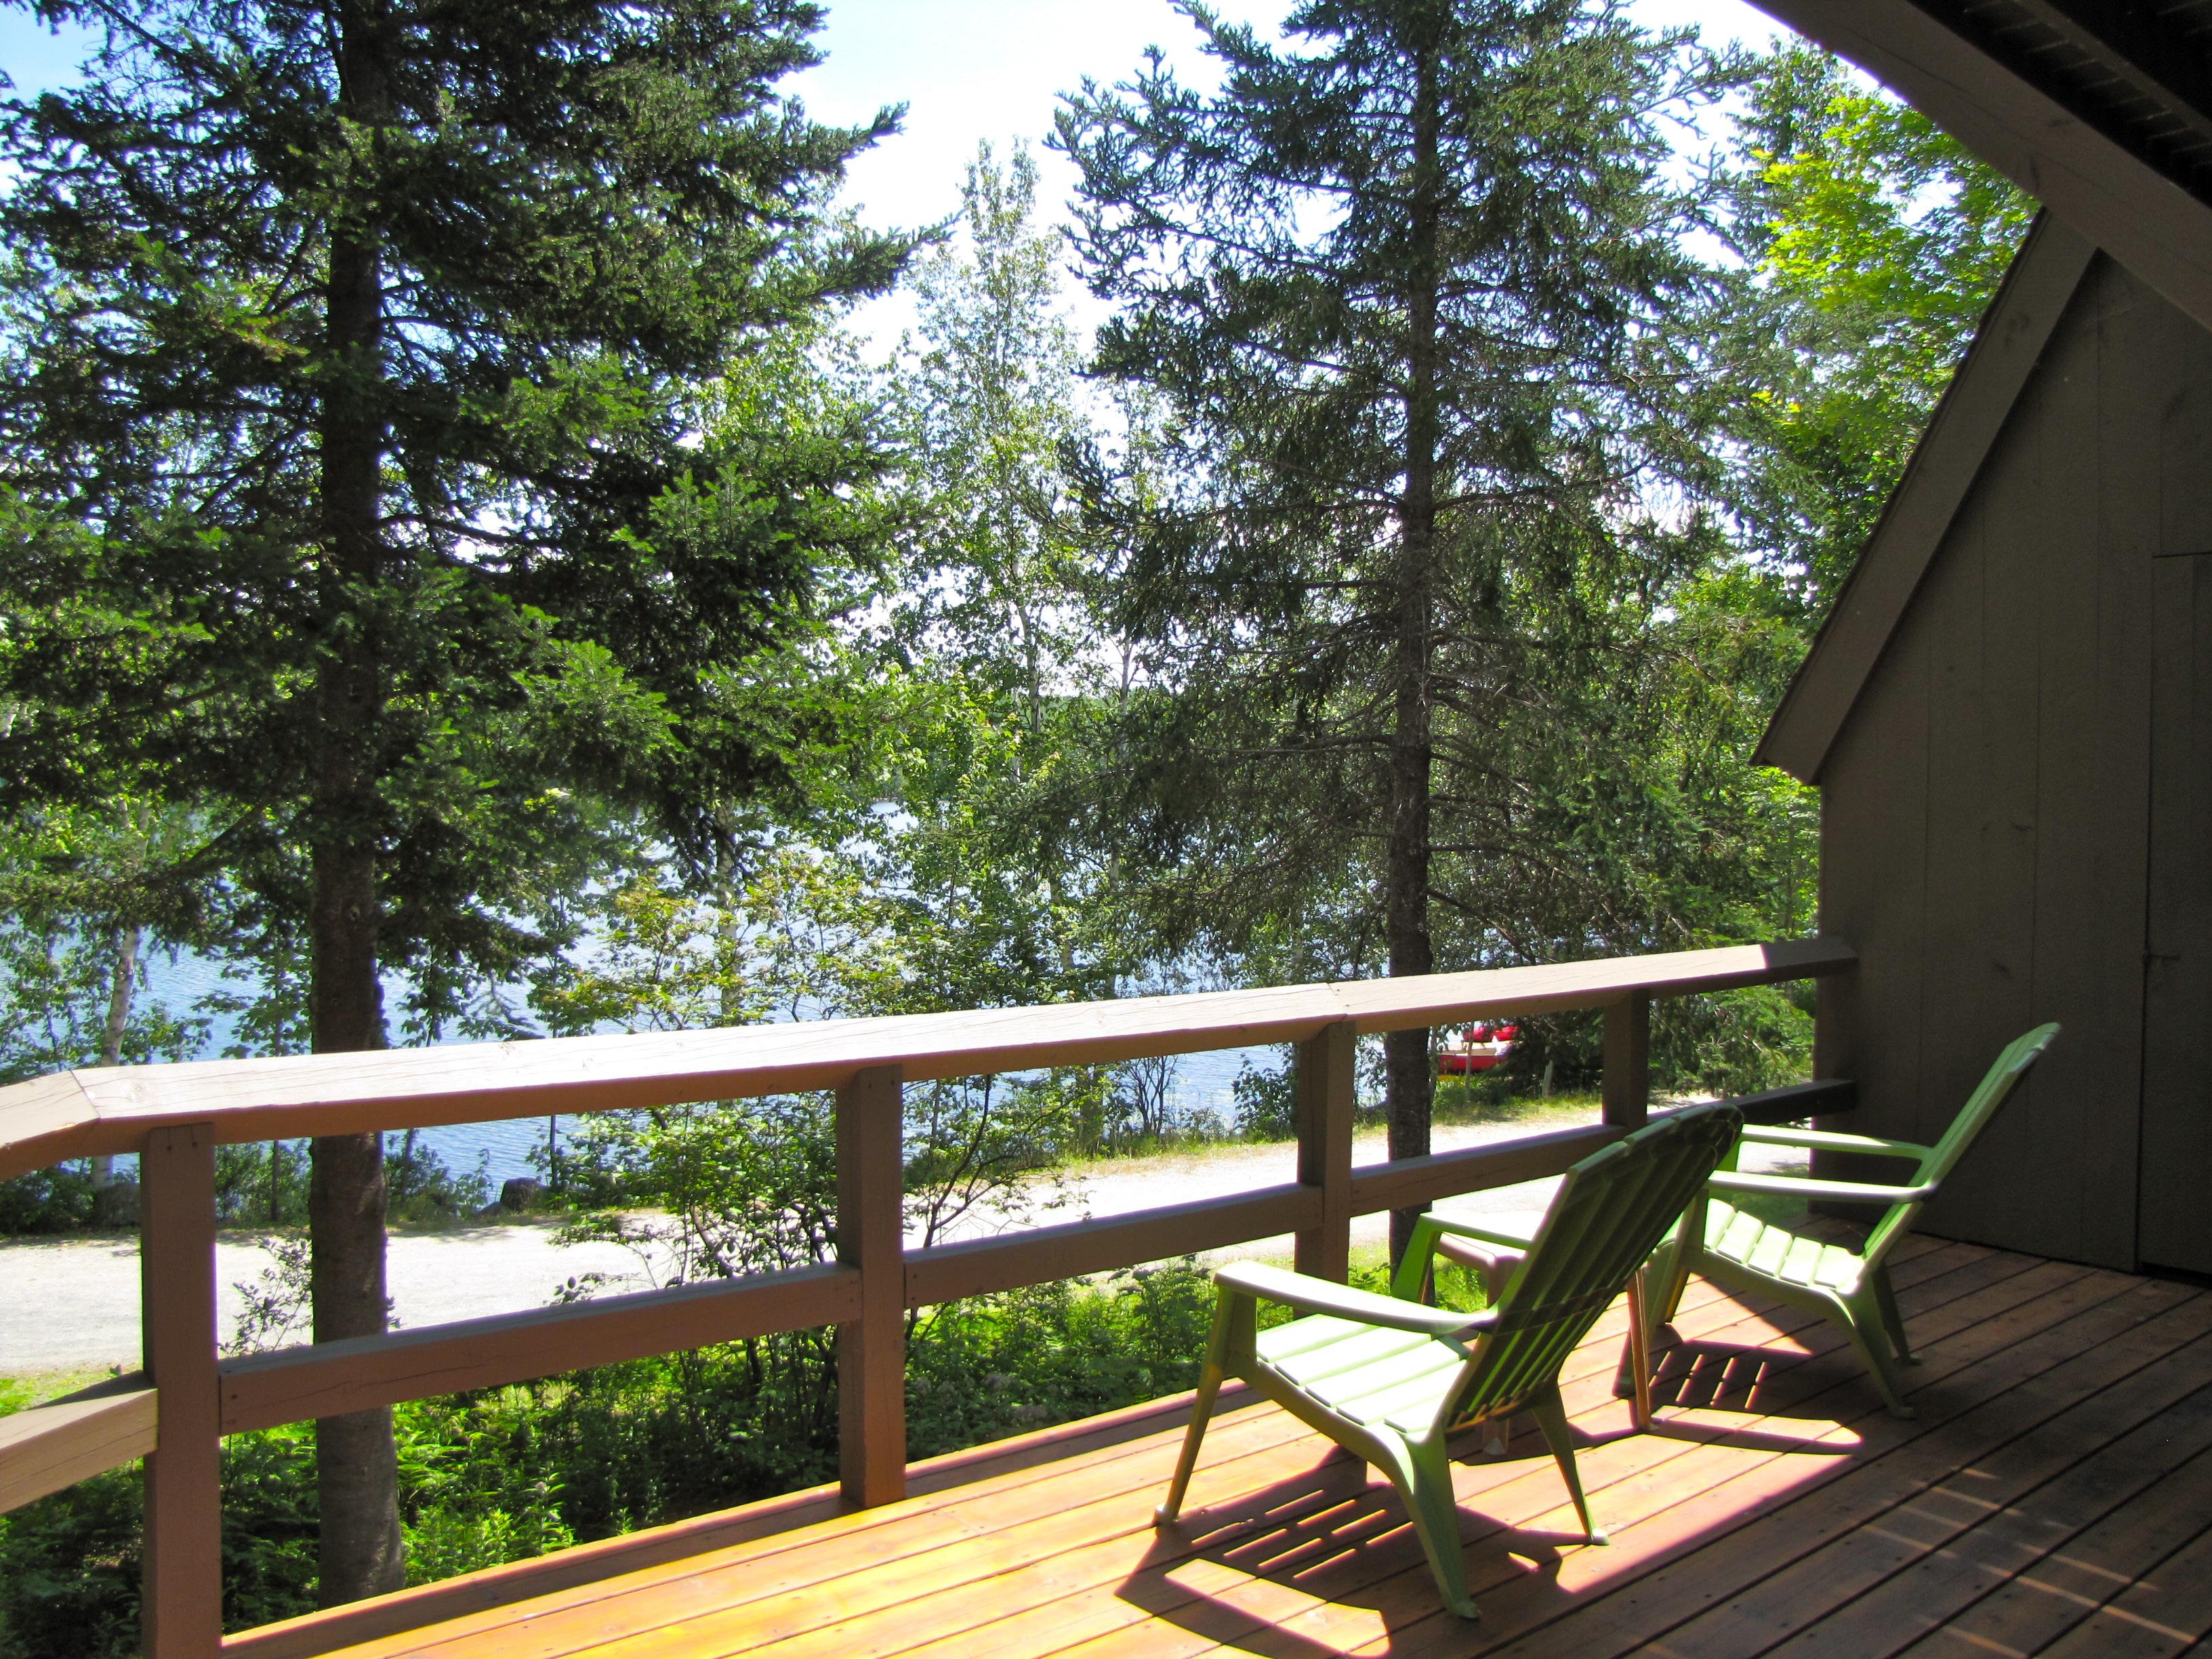 25 Island View, Eastman, NH Condo Rental